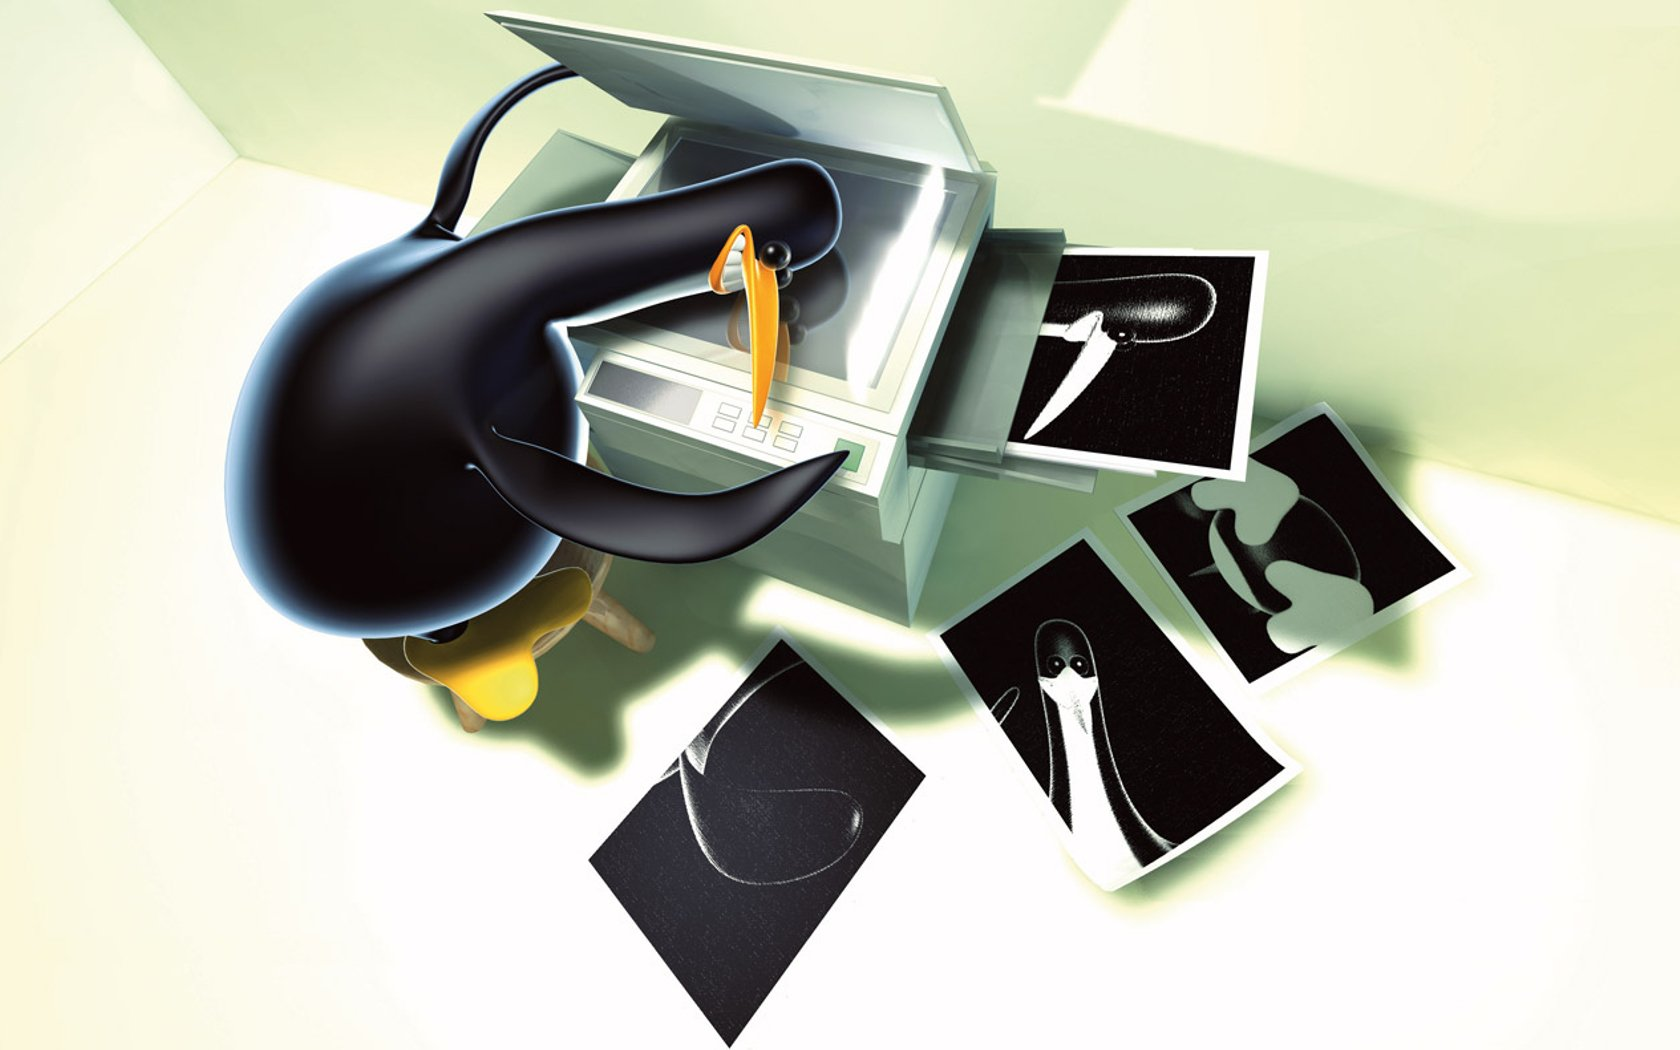 amusant fond d 39 cran and arri re plan 1680x1050 id 88431. Black Bedroom Furniture Sets. Home Design Ideas